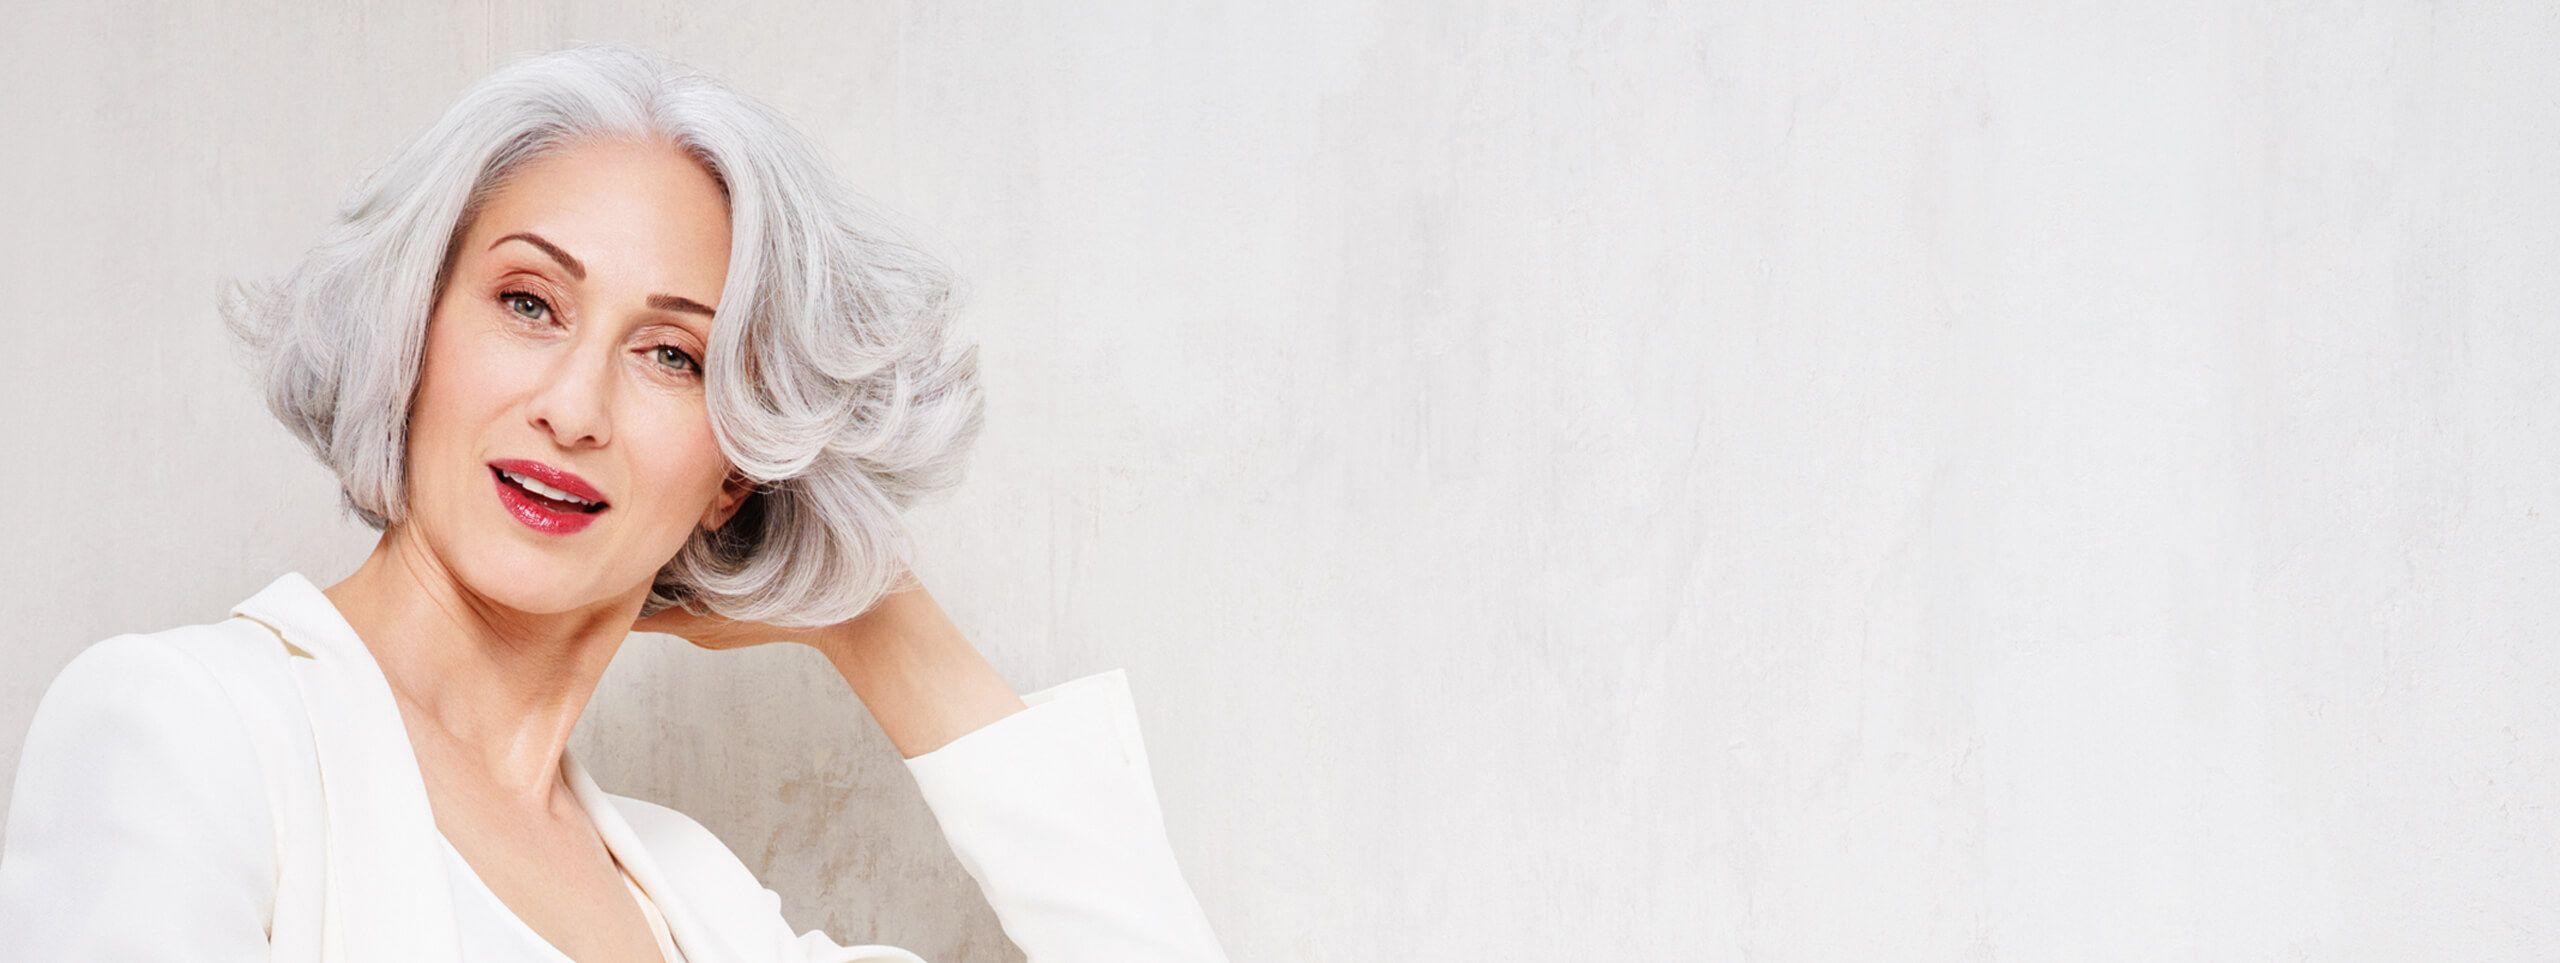 Woman wears light gray hair in a wavy bob hairstyle